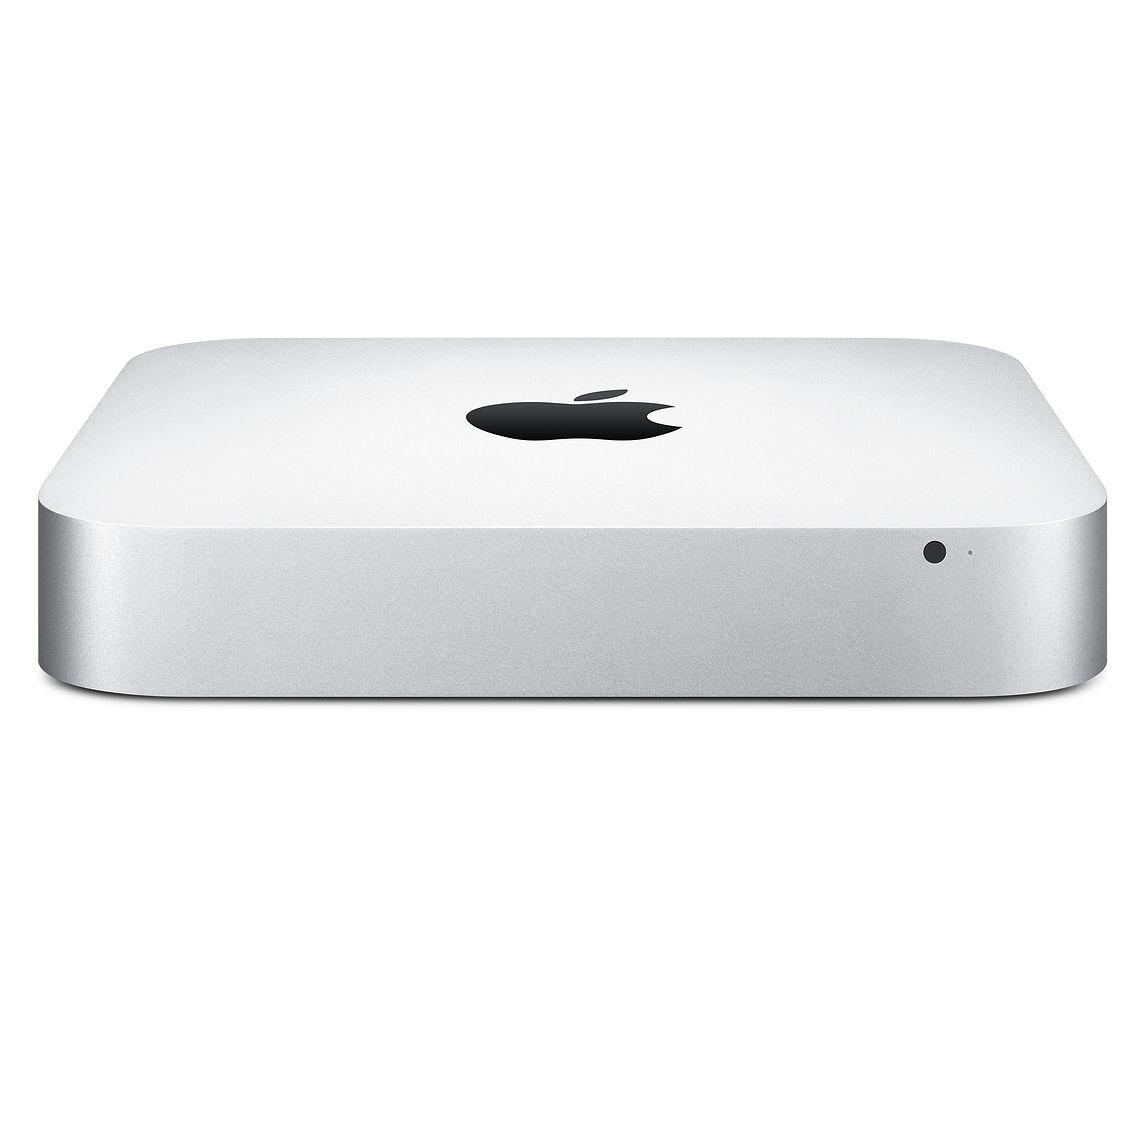 APPLE Mac mini_1TB硬碟2.6GHz 雙核心 / 第四代 i5